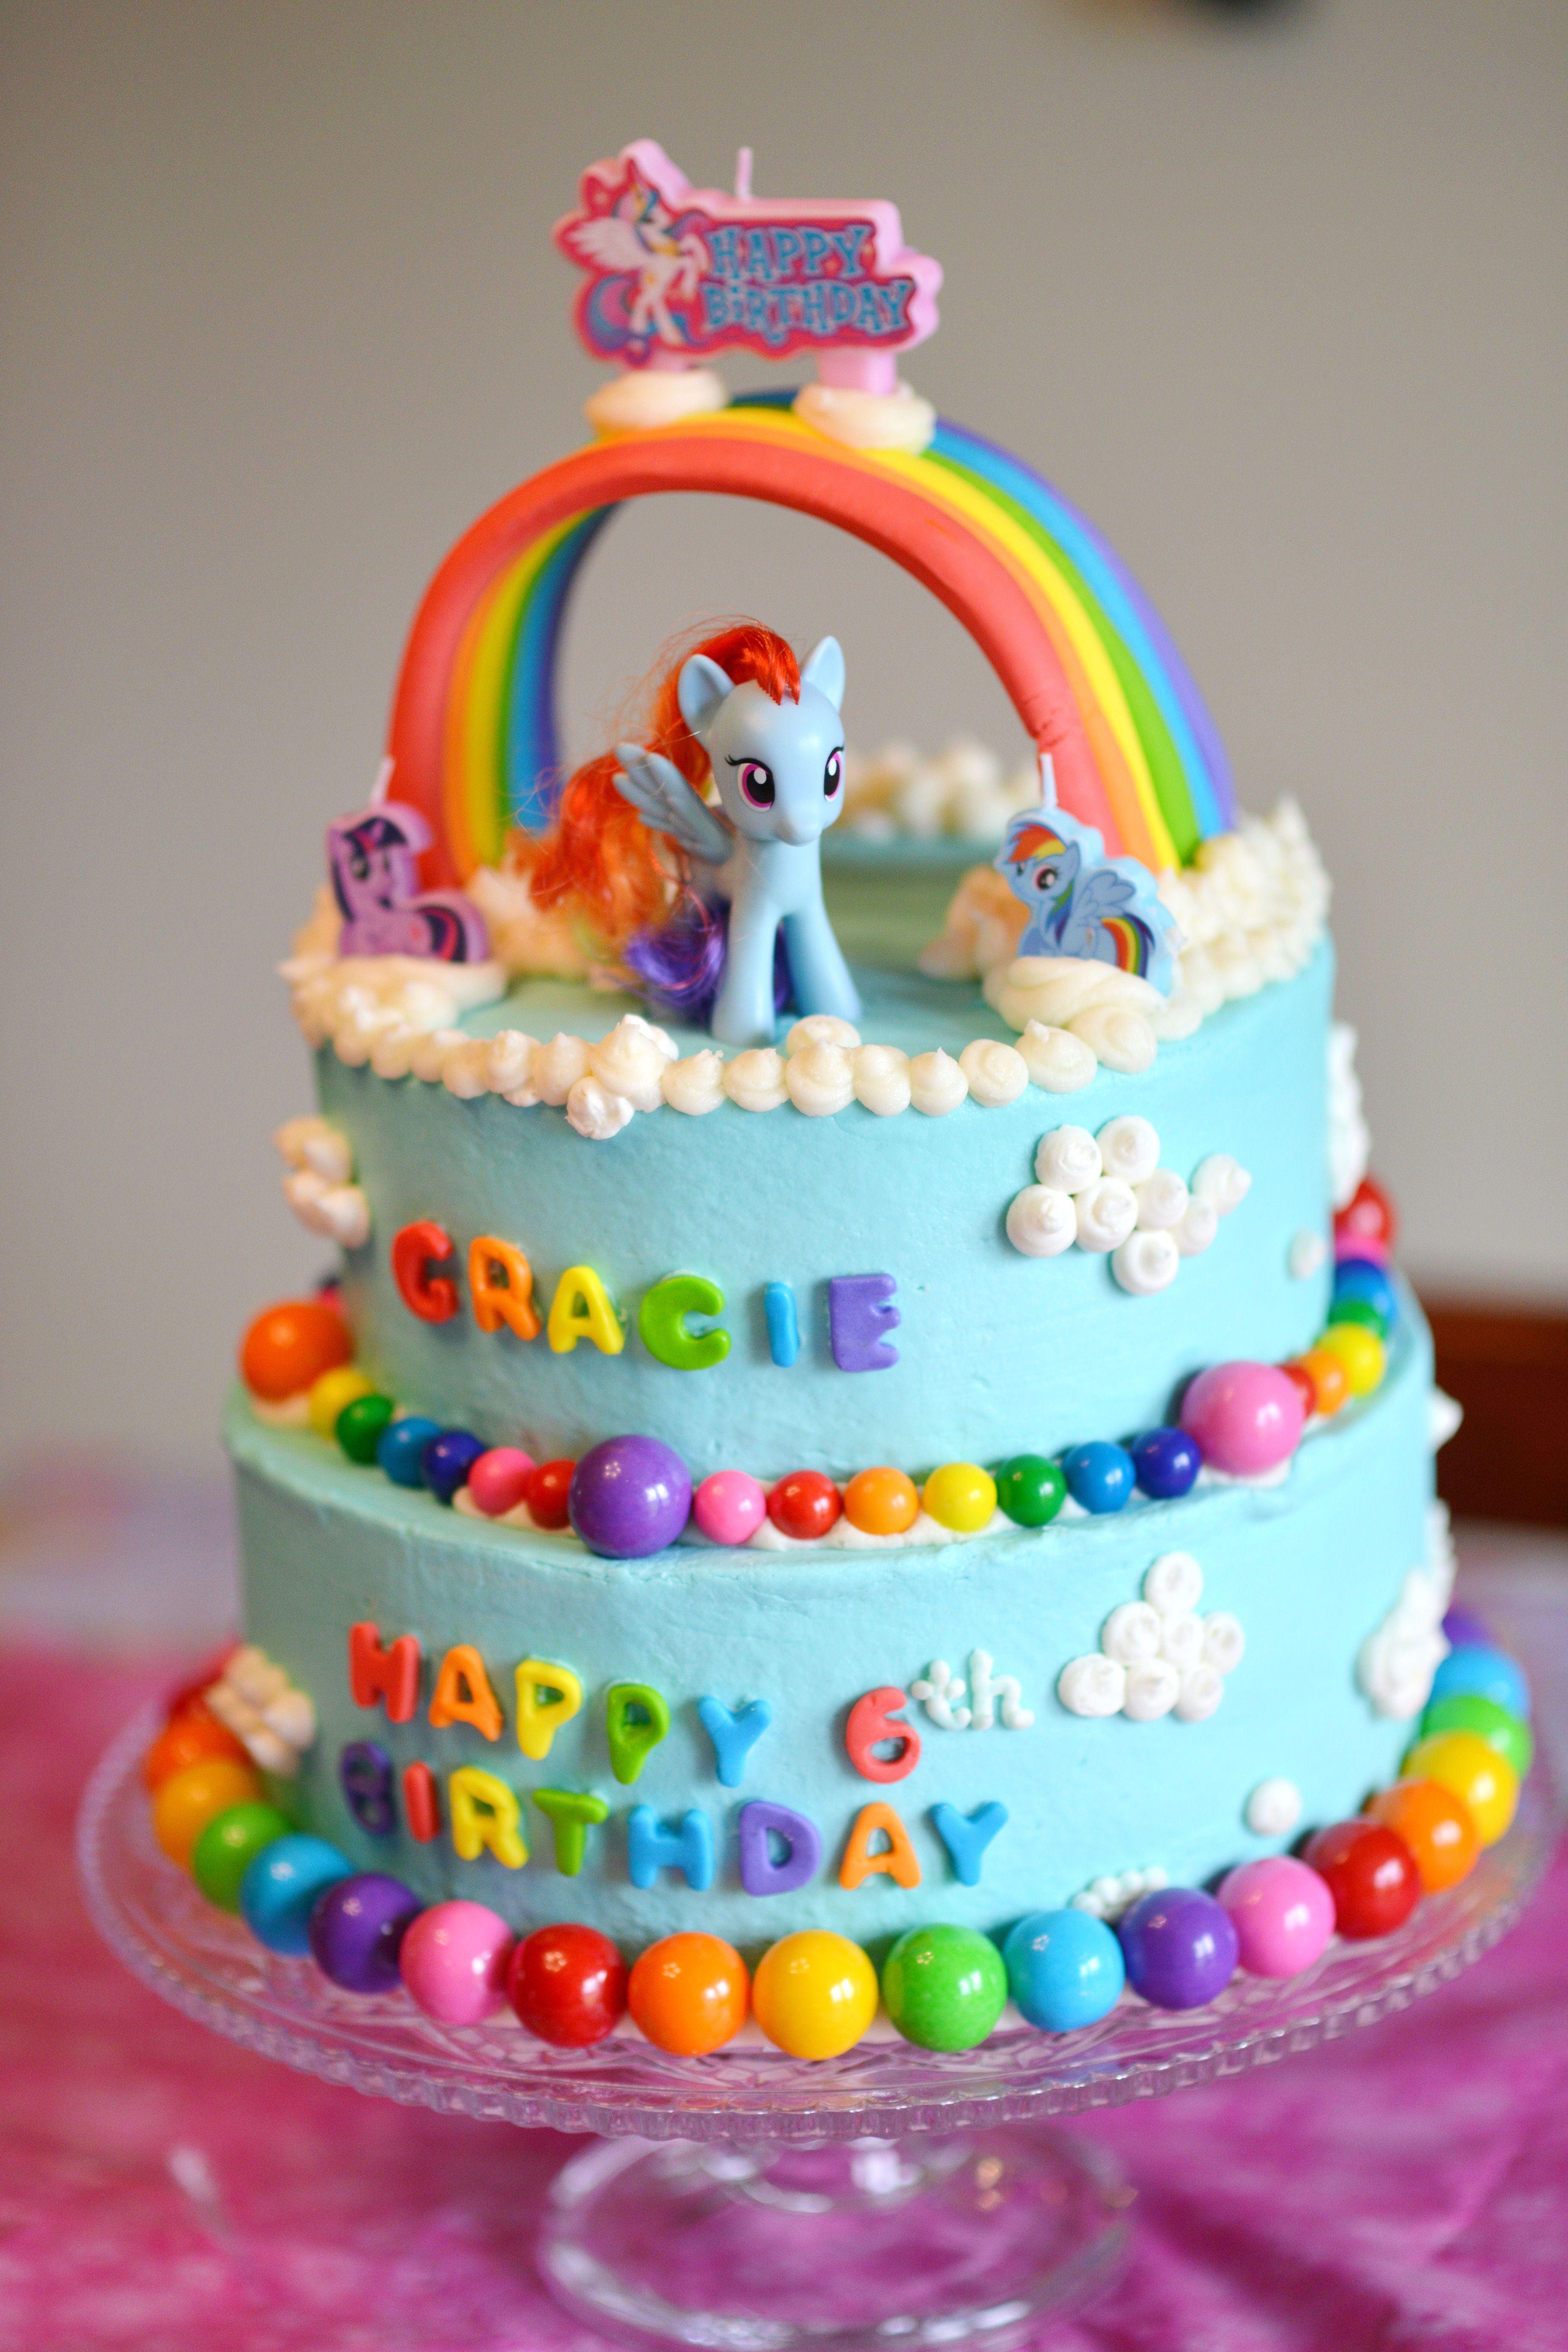 Outstanding 35 Inspired Image Of Rainbow Dash Birthday Cake Little Pony Funny Birthday Cards Online Fluifree Goldxyz